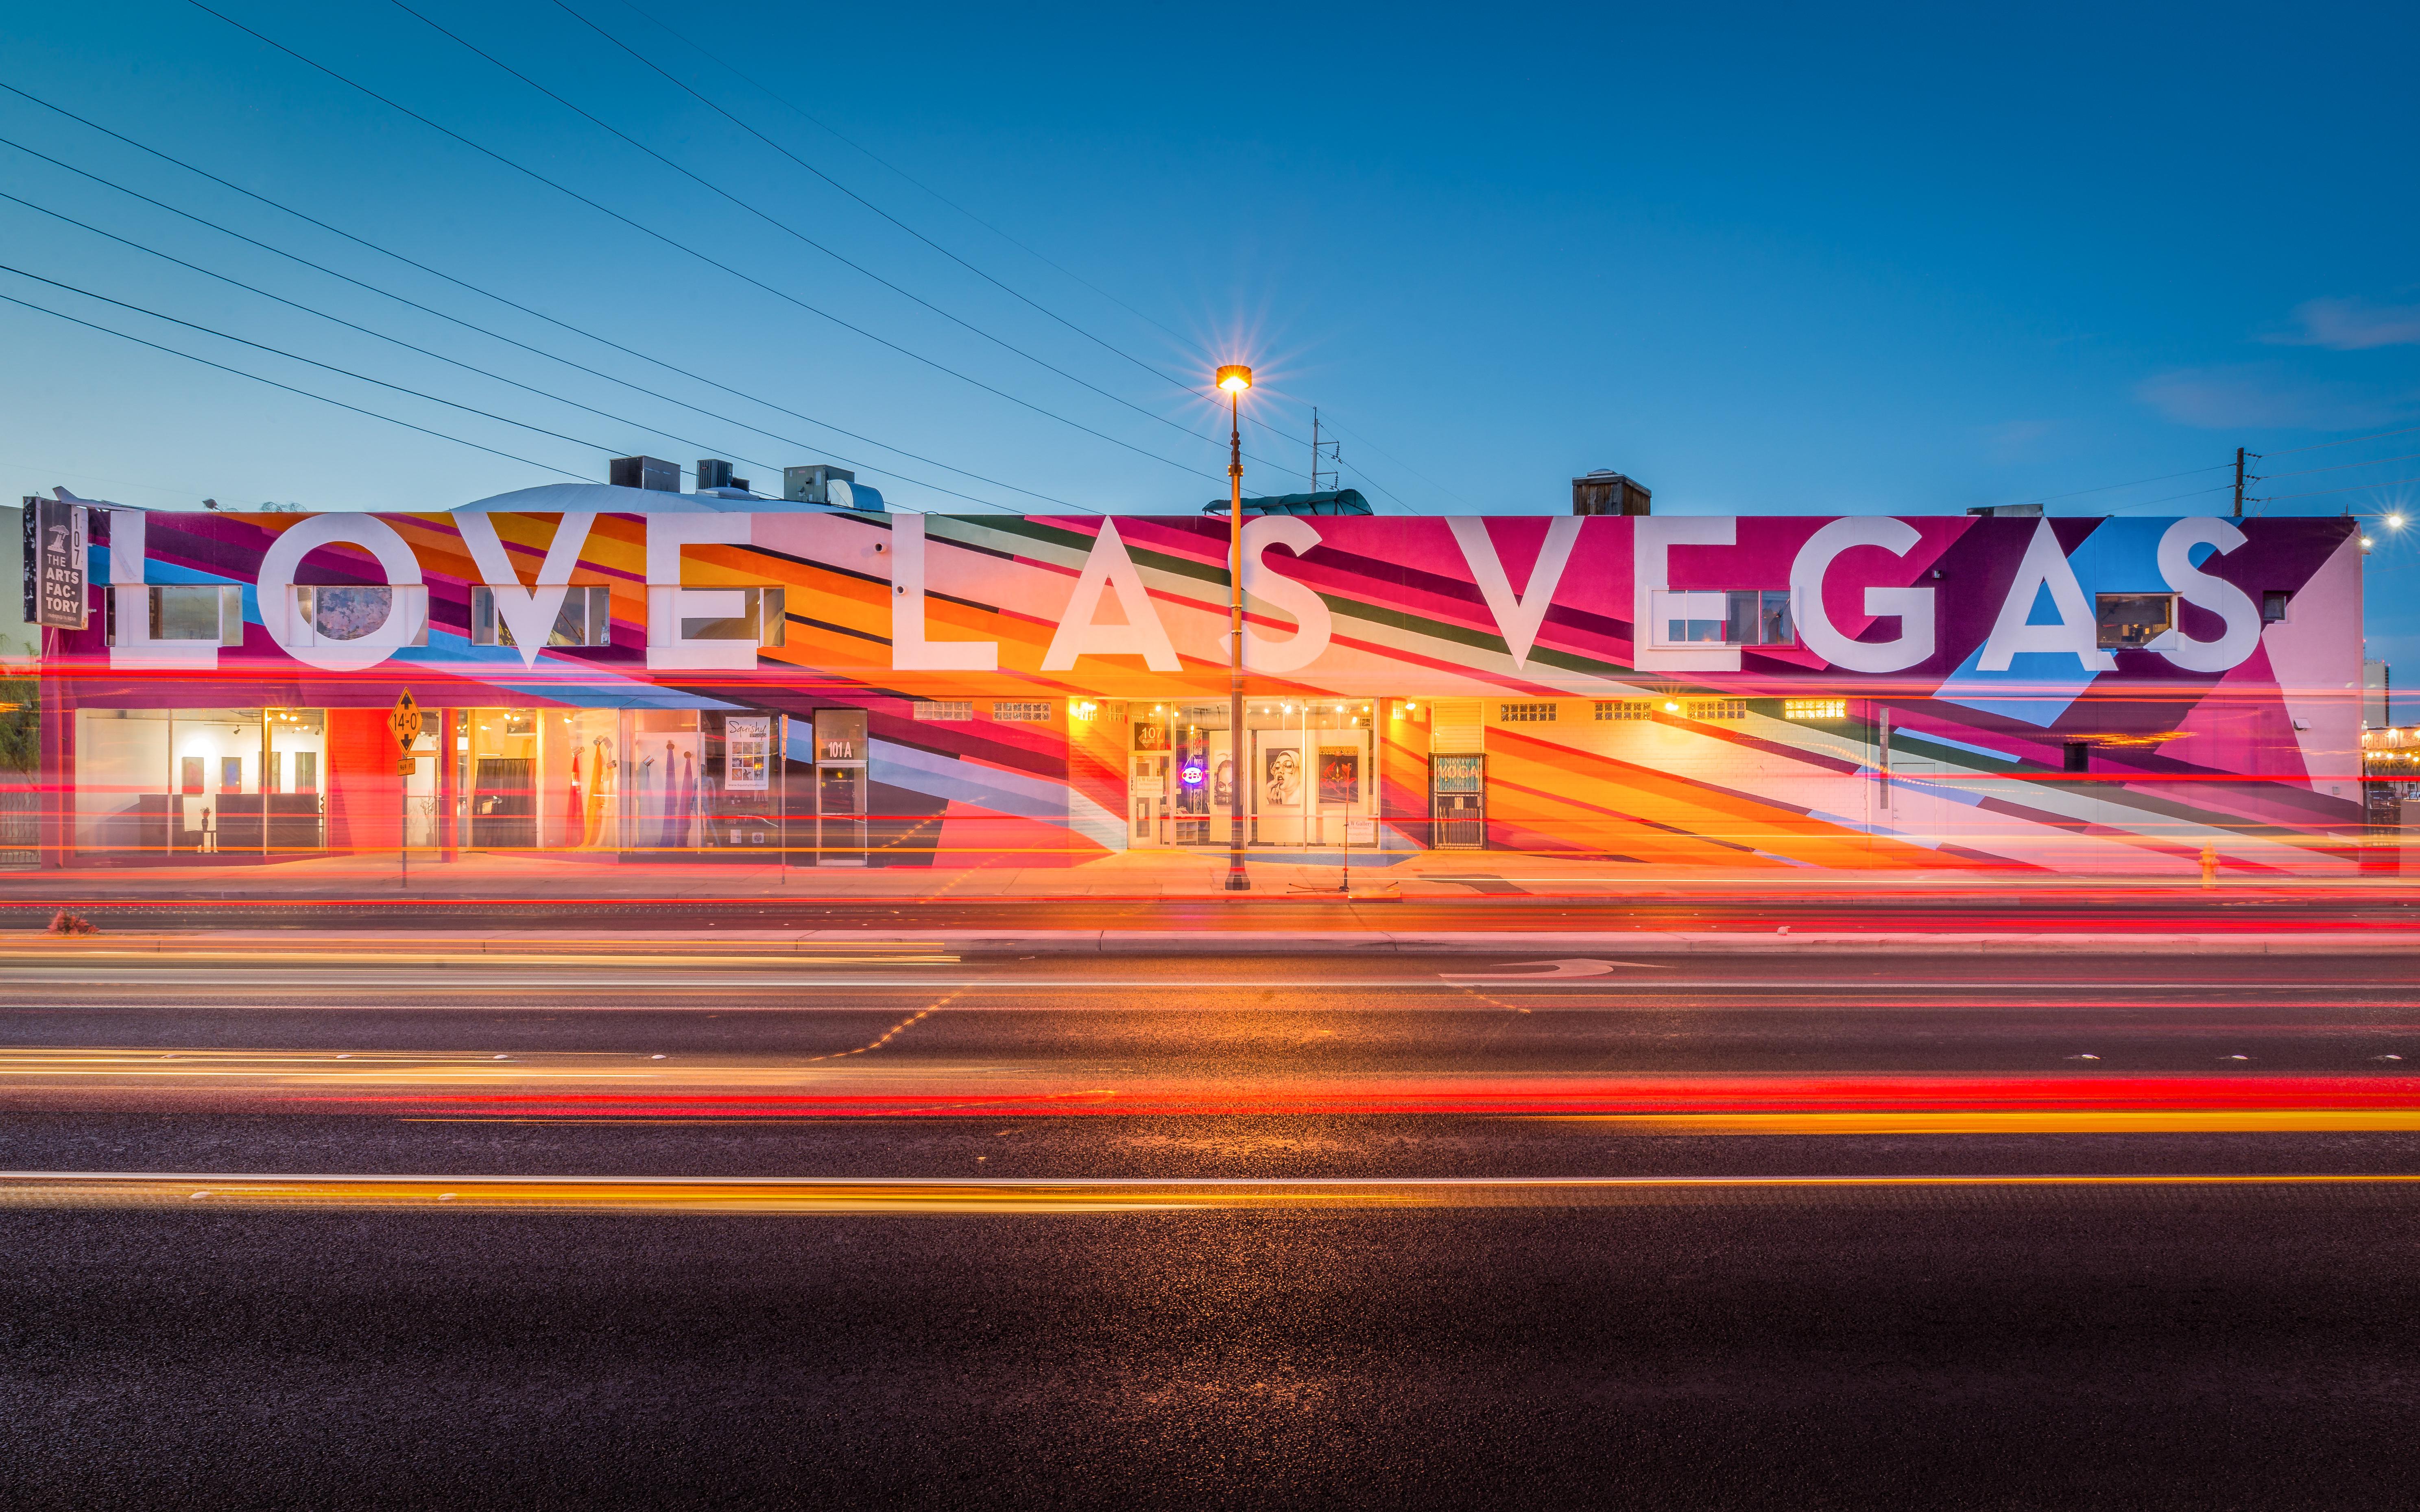 Las Vegas Arts Factory